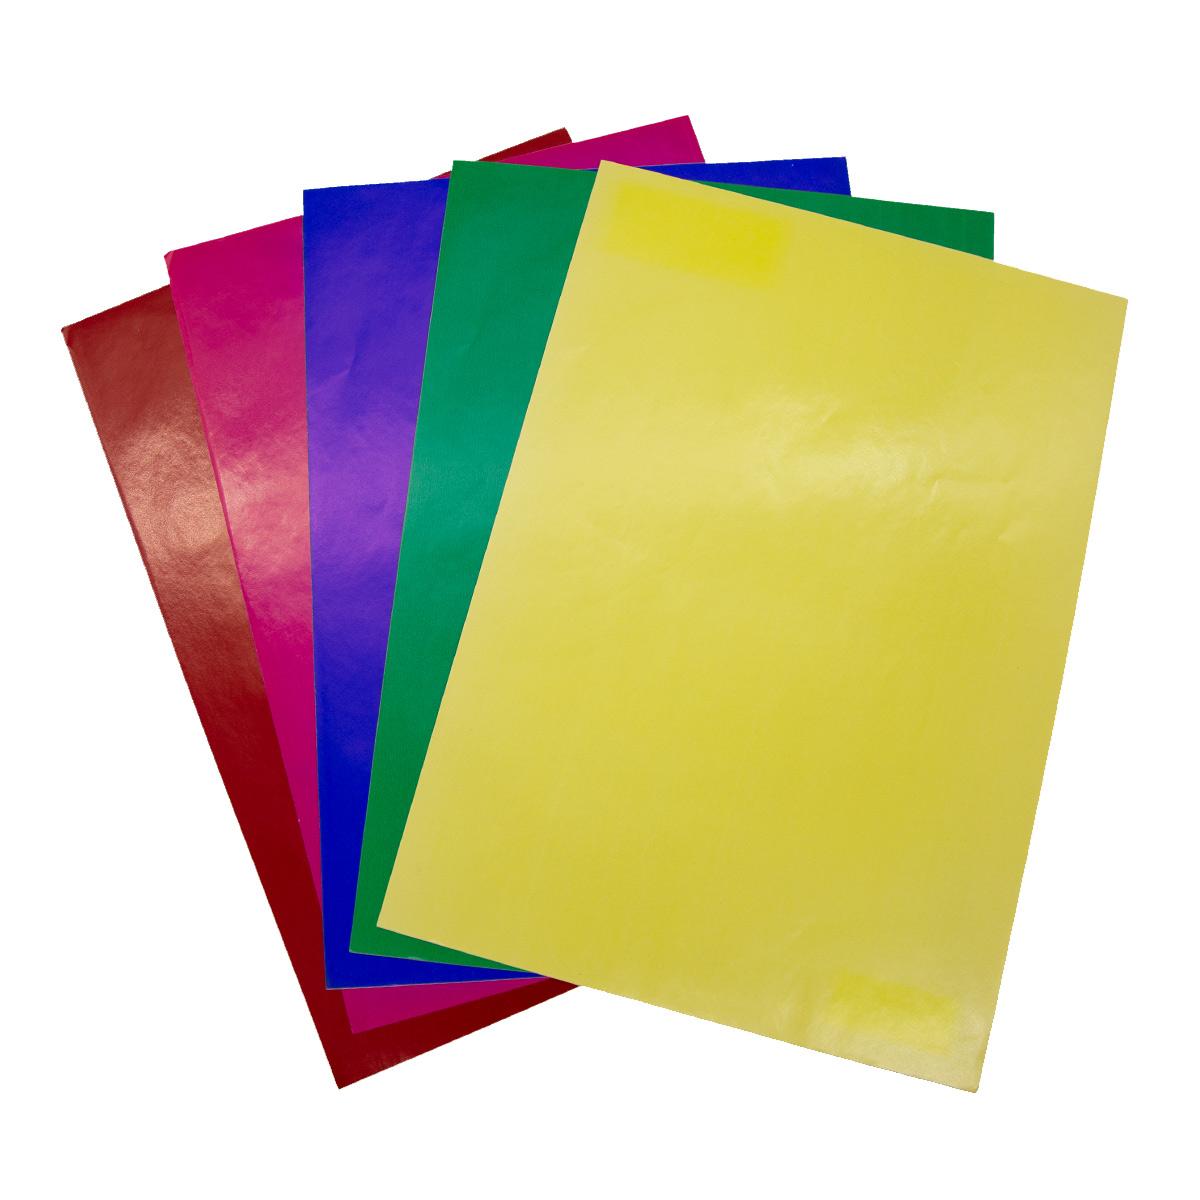 Бумага глянцевая клейкая, 200 гр, упак./5 листов